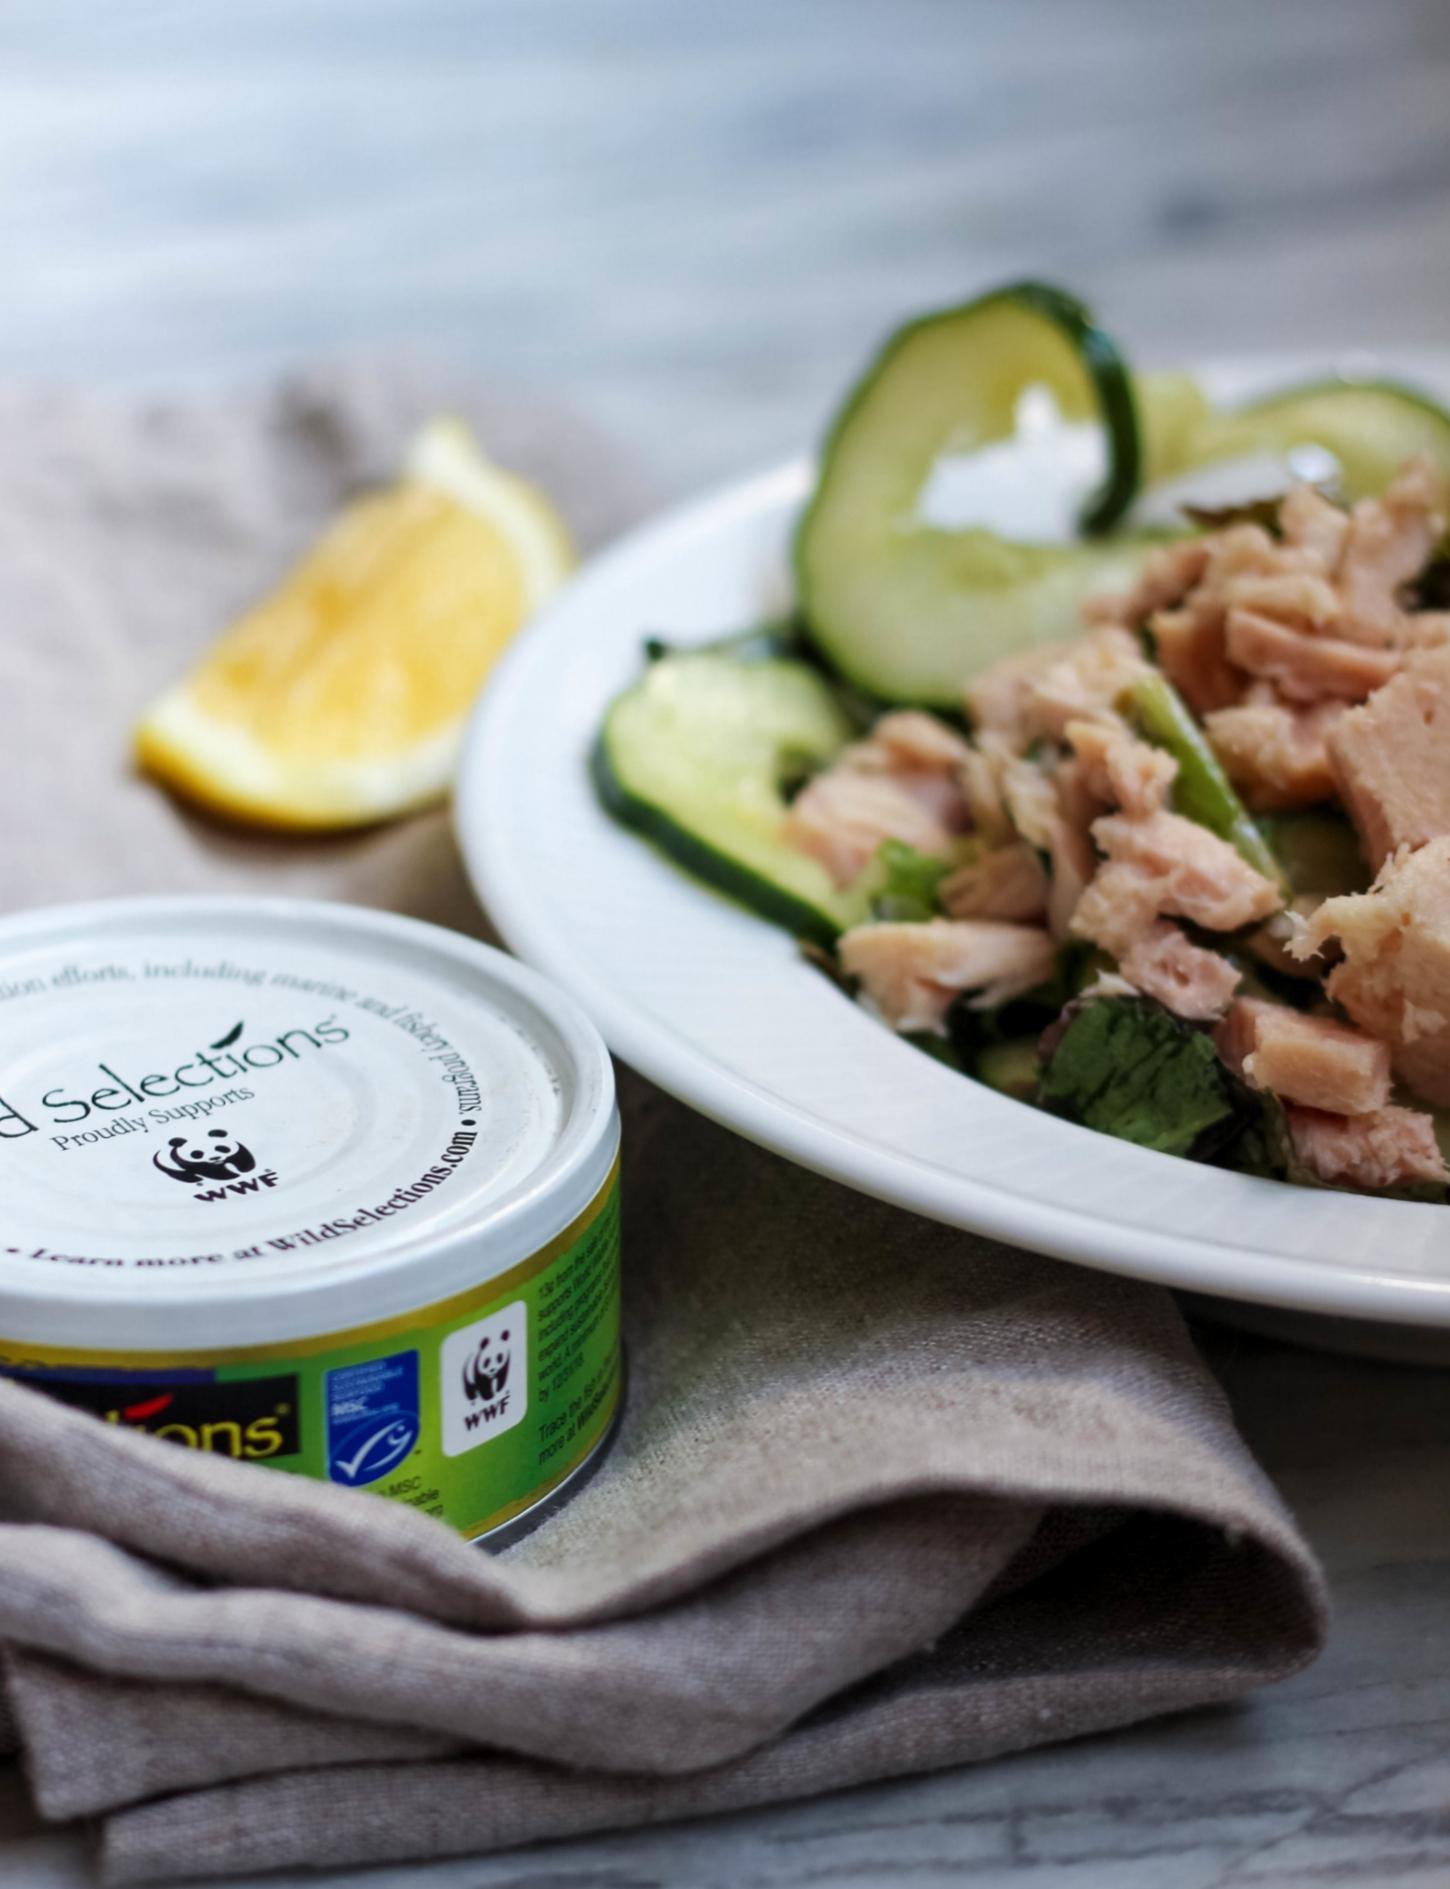 Lemony Cucumber Salad with Tuna and Peas | Freckled Italian